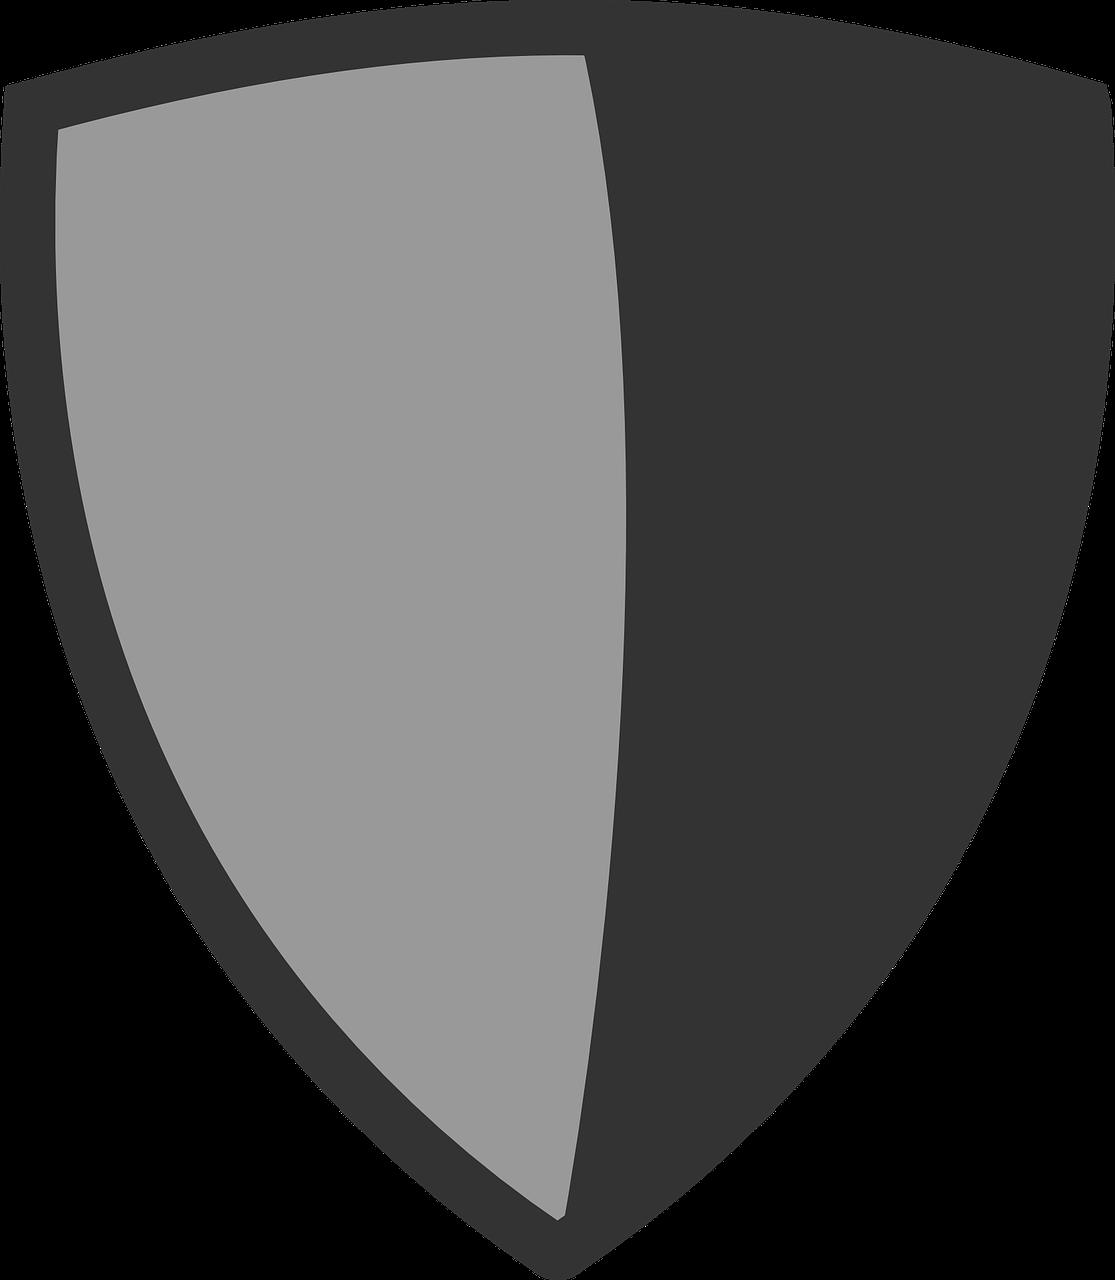 Icon of a shield